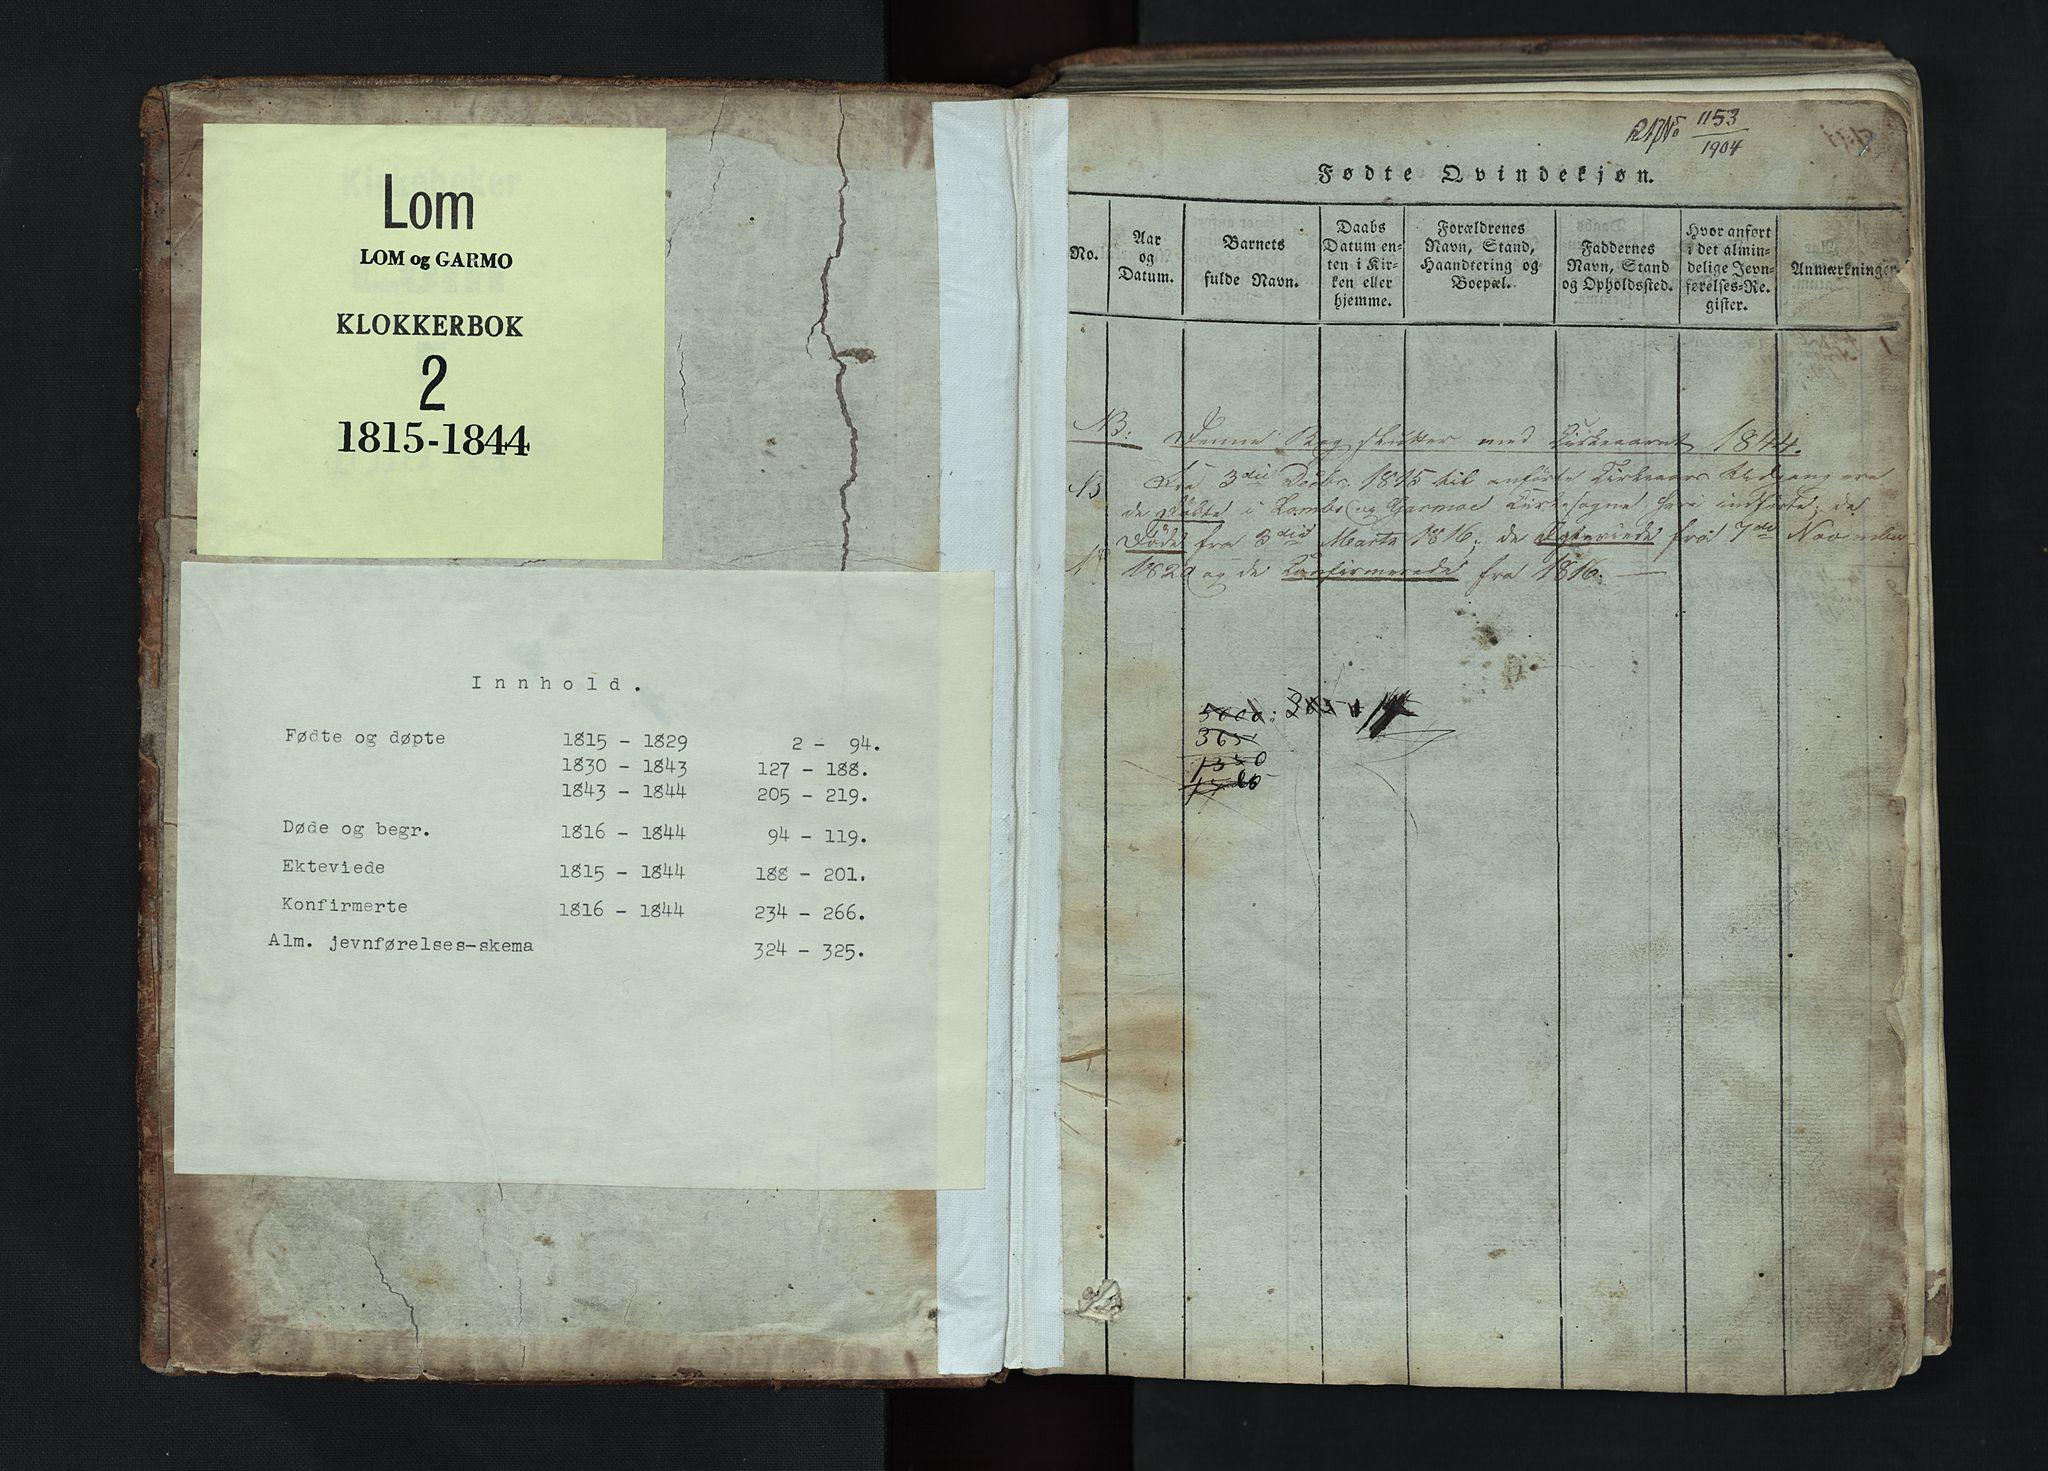 SAH, Lom prestekontor, L/L0002: Parish register (copy) no. 2, 1815-1844, p. 1